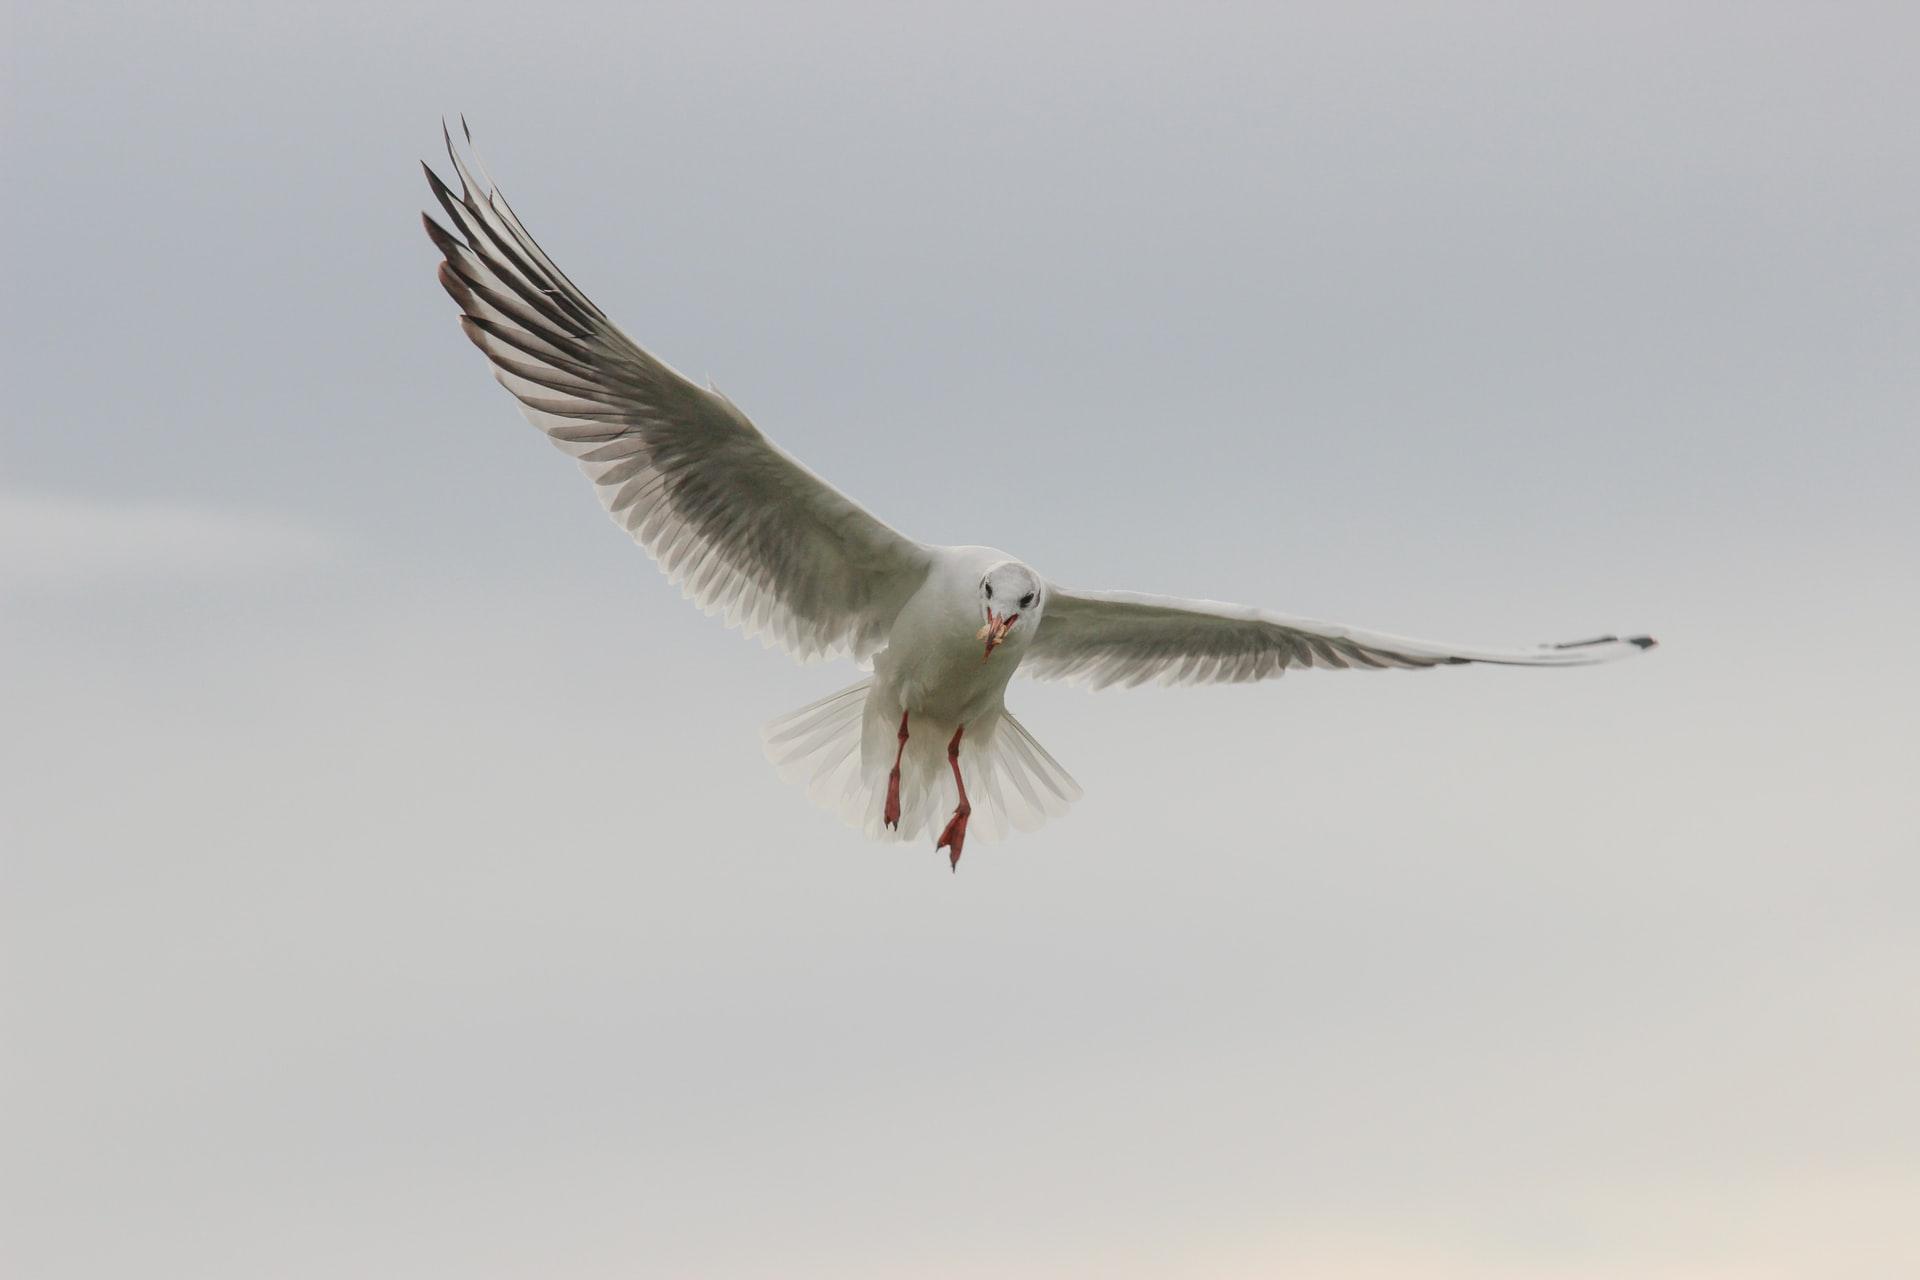 A menacing seagull. Image credit: Sebastian Herrmann on Unsplash.